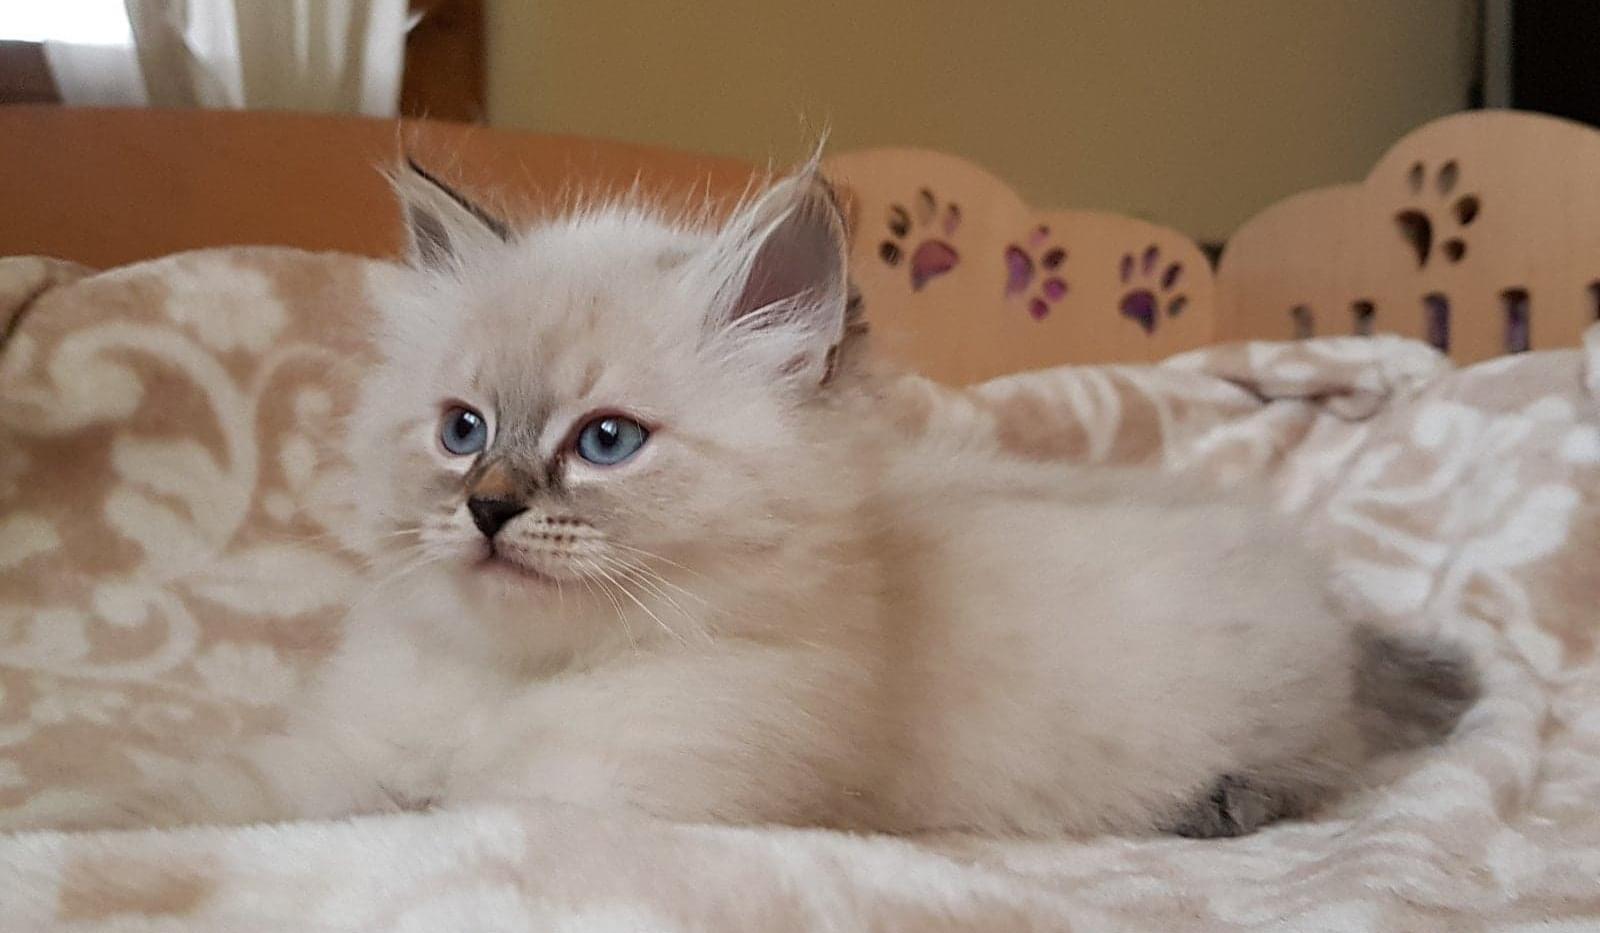 Ofel, a Purebred Siberian Kitten